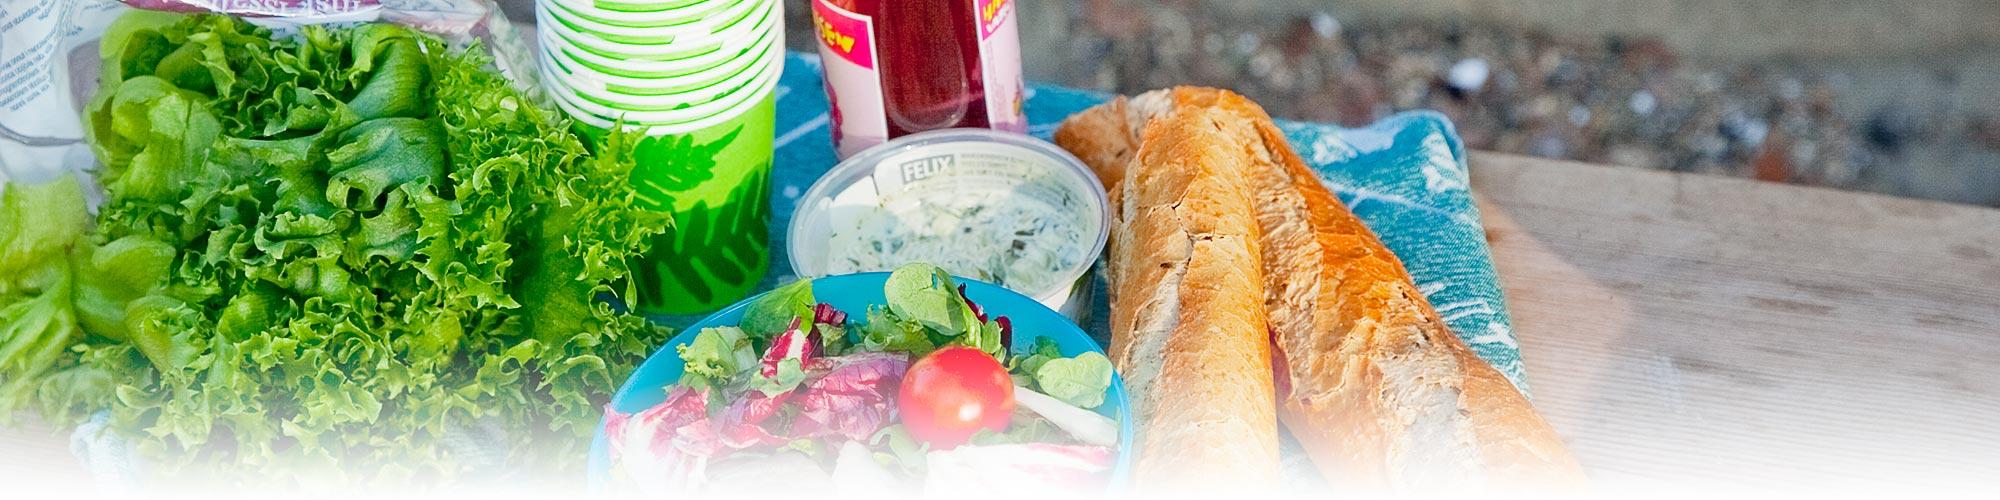 Tommolansalmi restaurant picnic